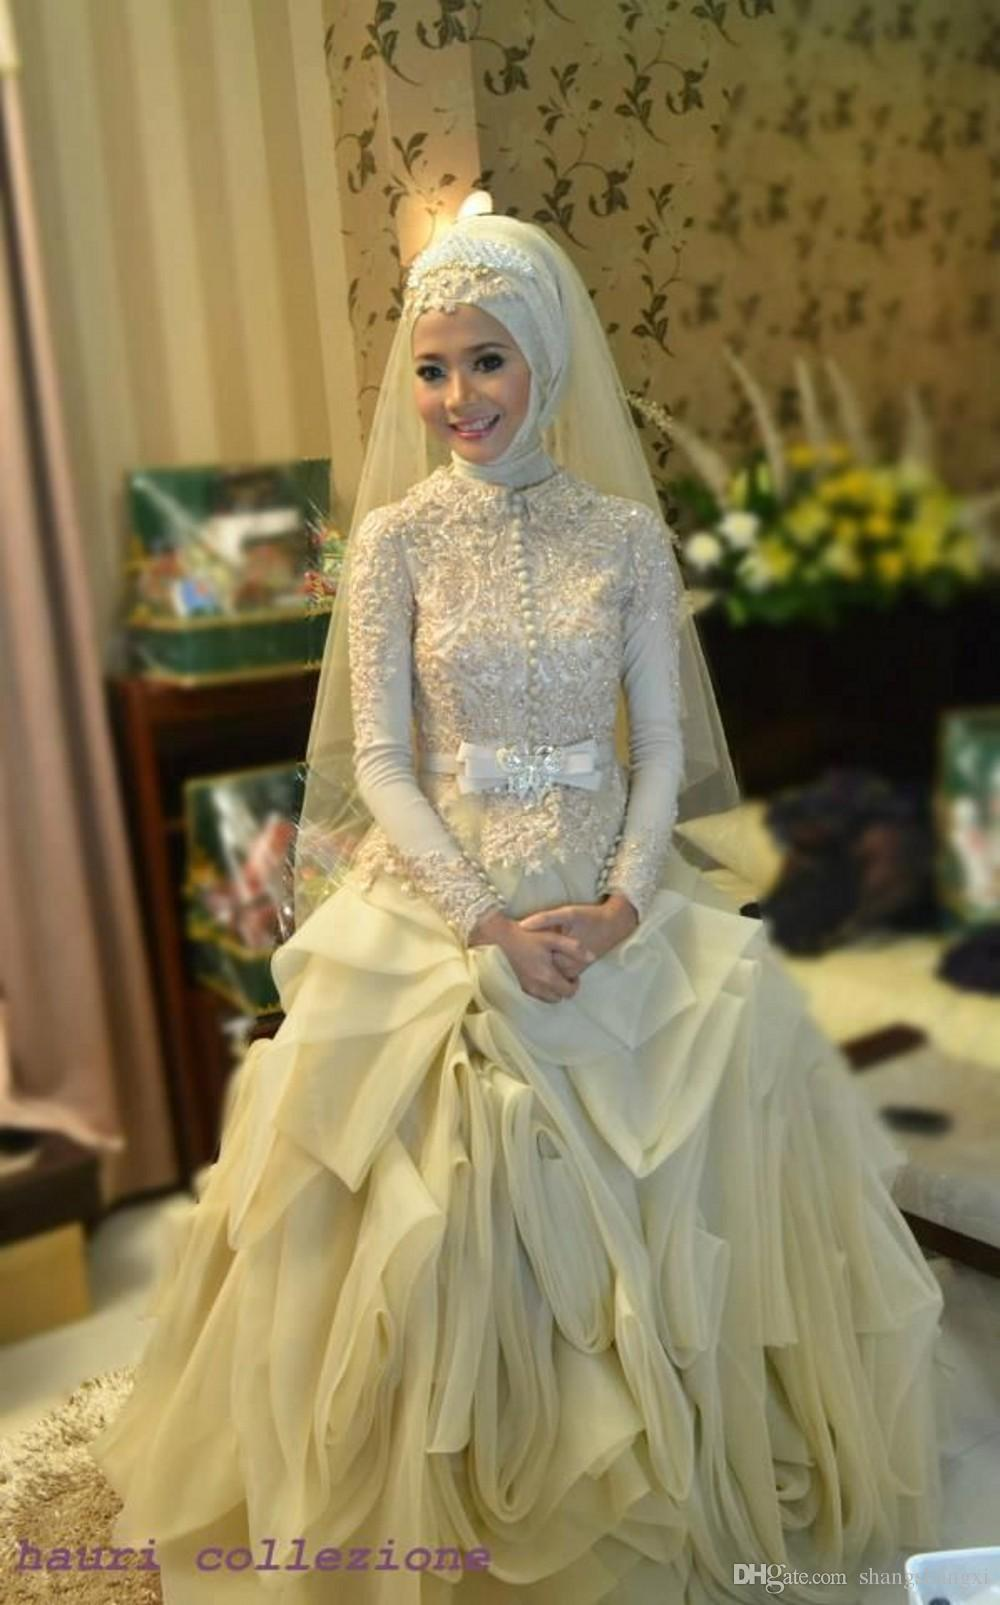 بالصور اجمل صور فساتين زفاف , اشيك فساتين زفاف 2019 5285 6